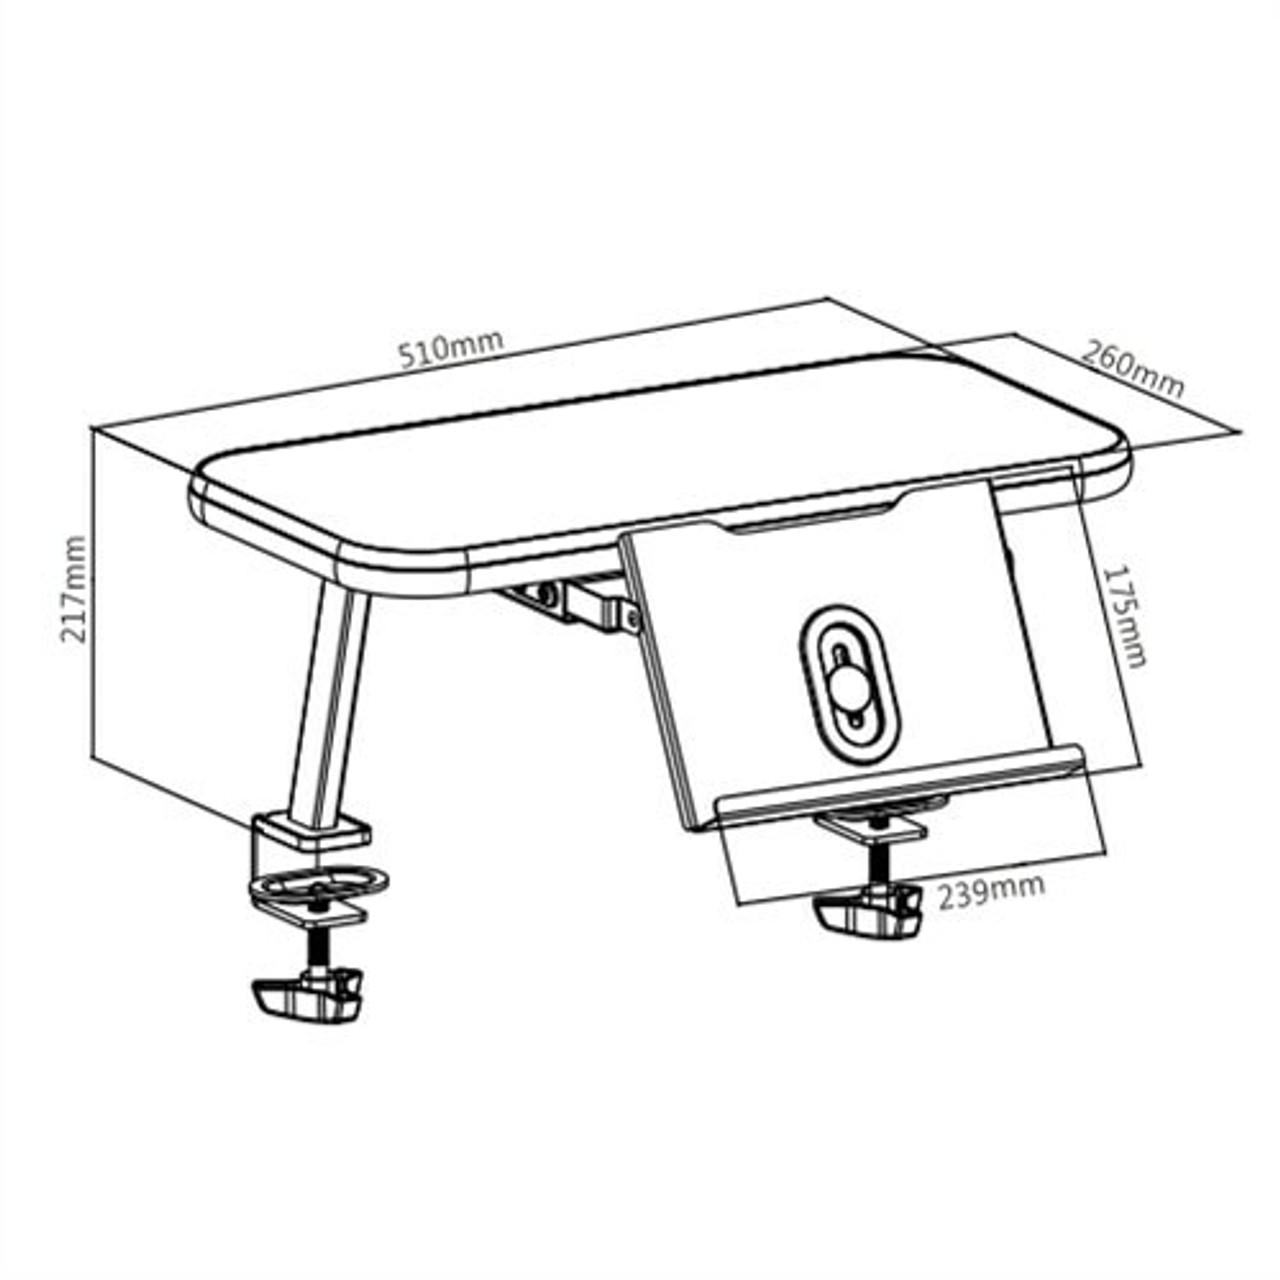 EFurnit Teens Desk Book Shelf , Small , 51x26 cm